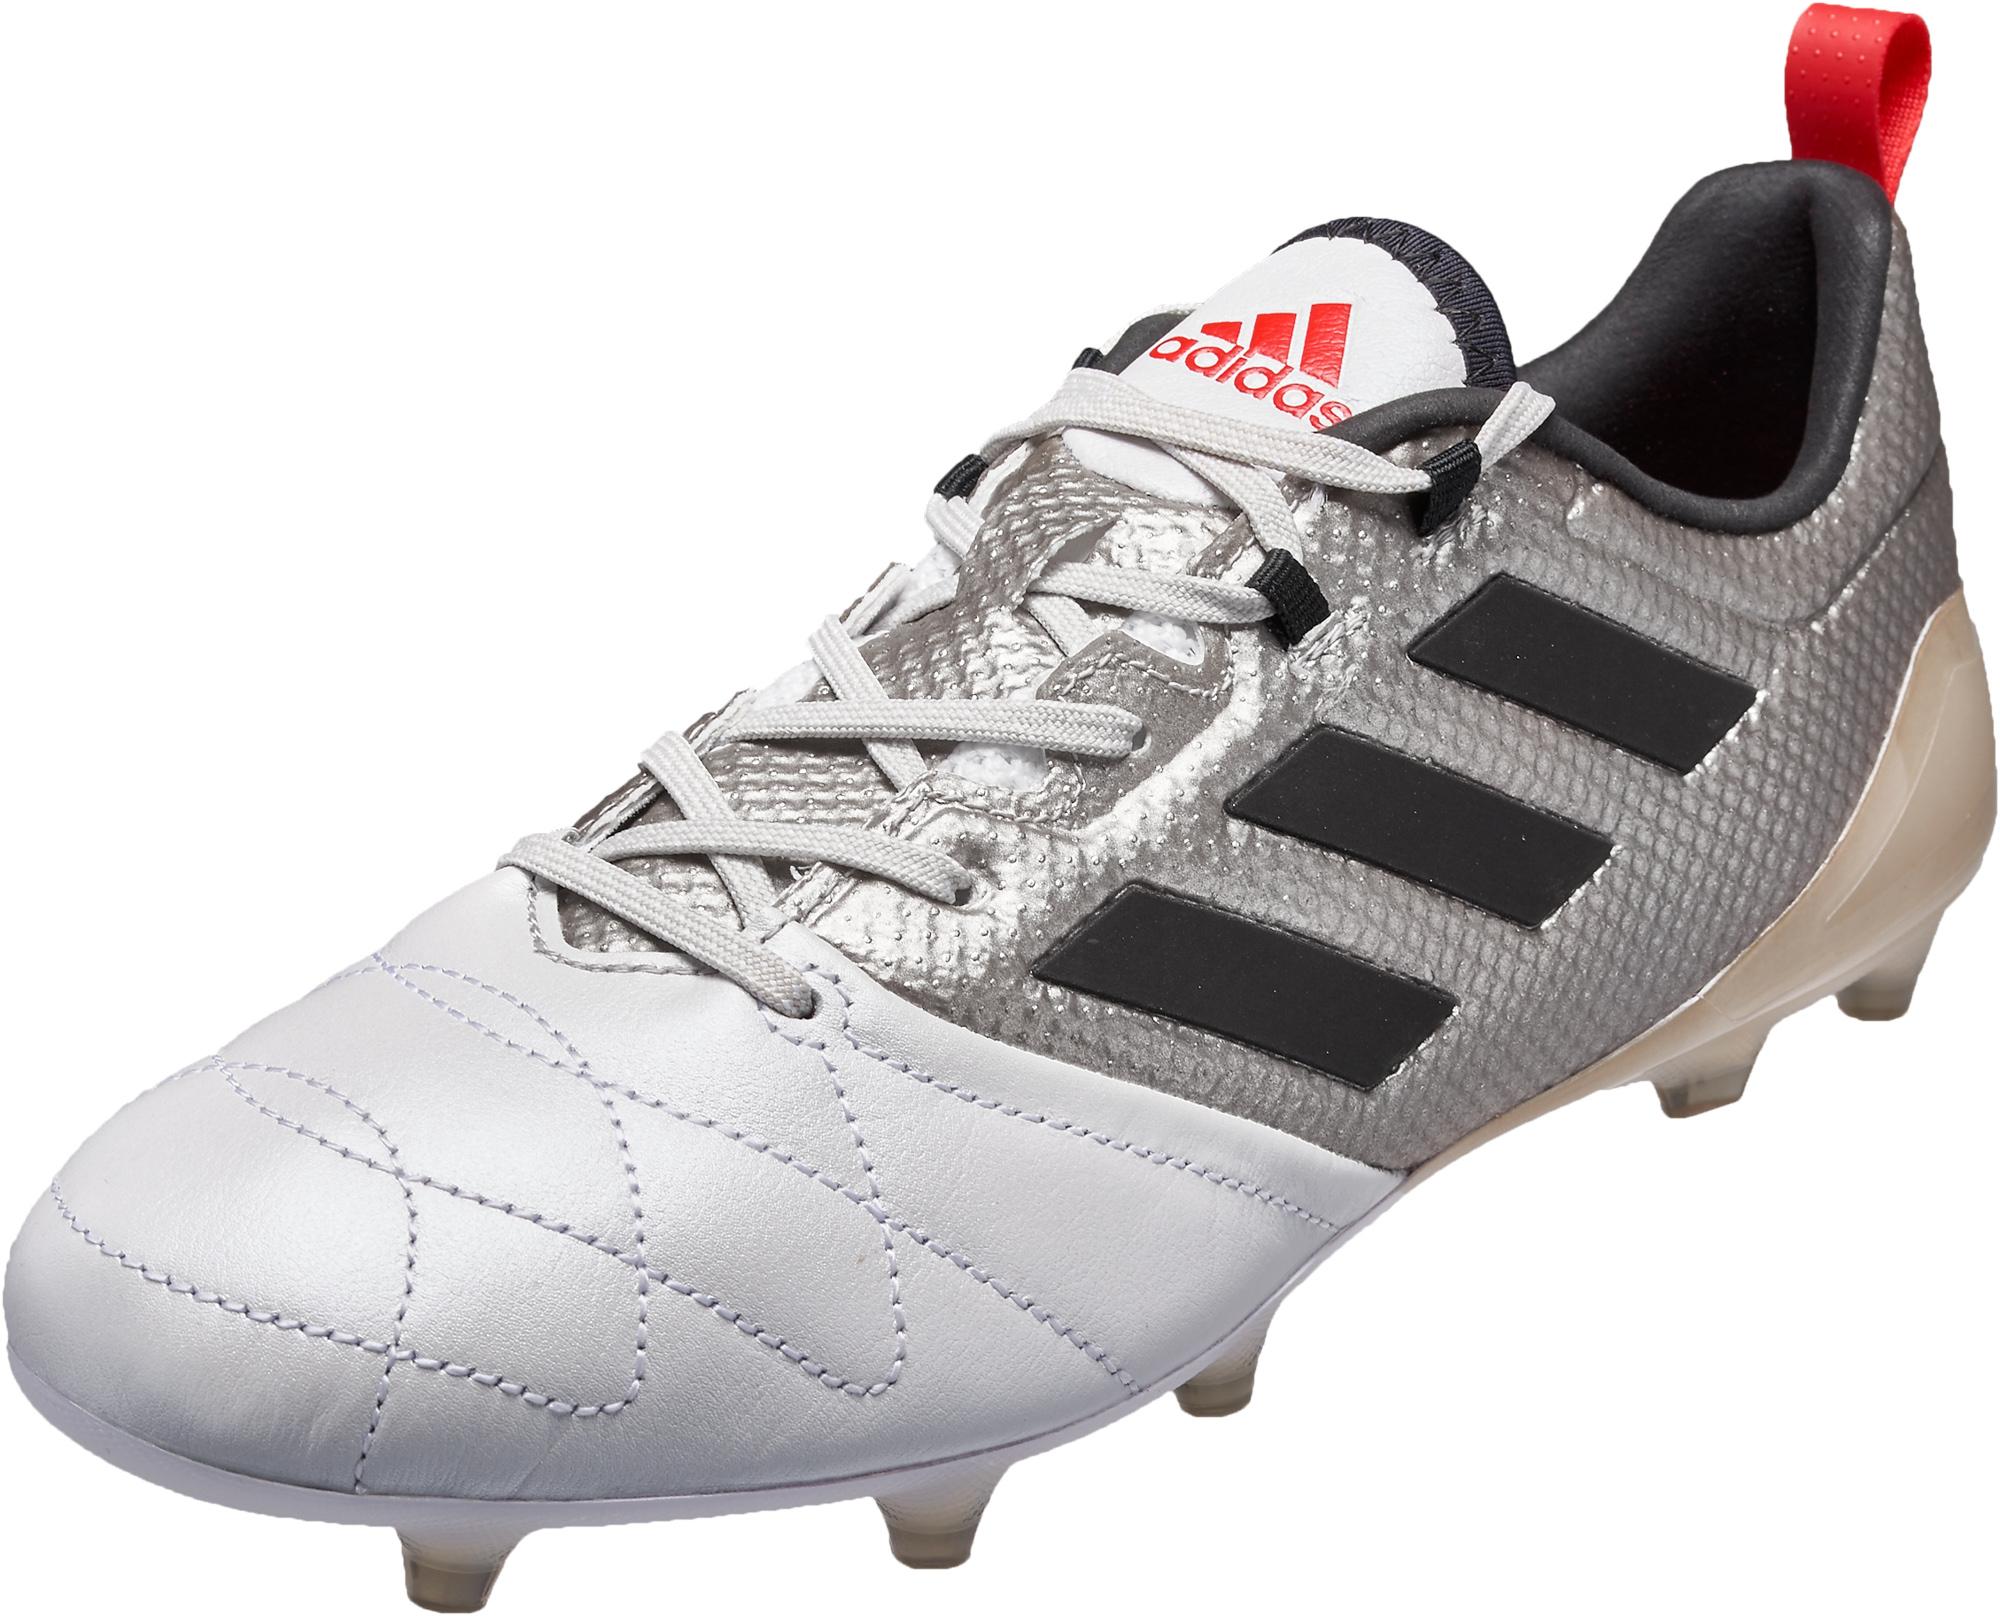 adidas Womens ACE 17.1 FG Soccer Cleats - SoccerPro.com 3ddca7185d